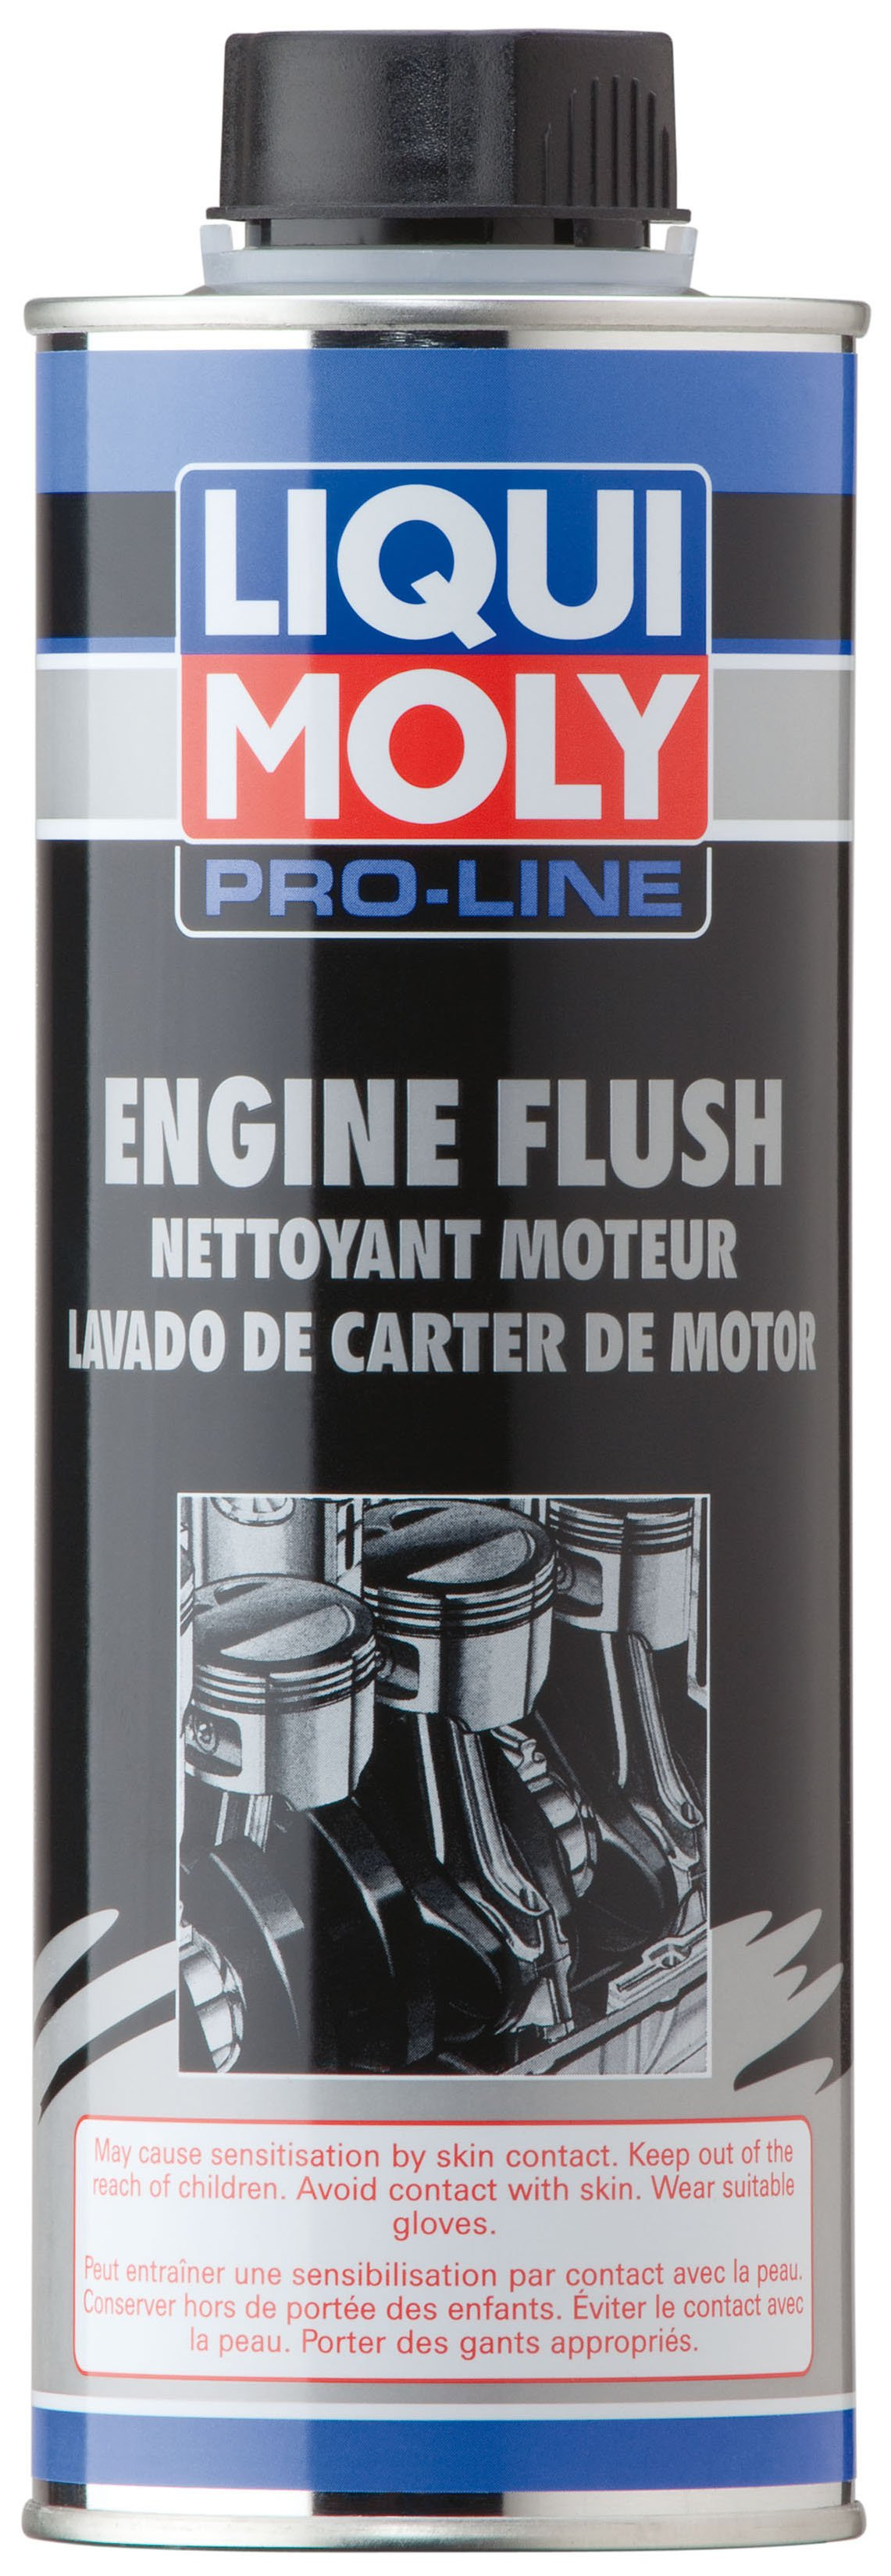 Liqui Moly Pro-Line-Engine-Flush